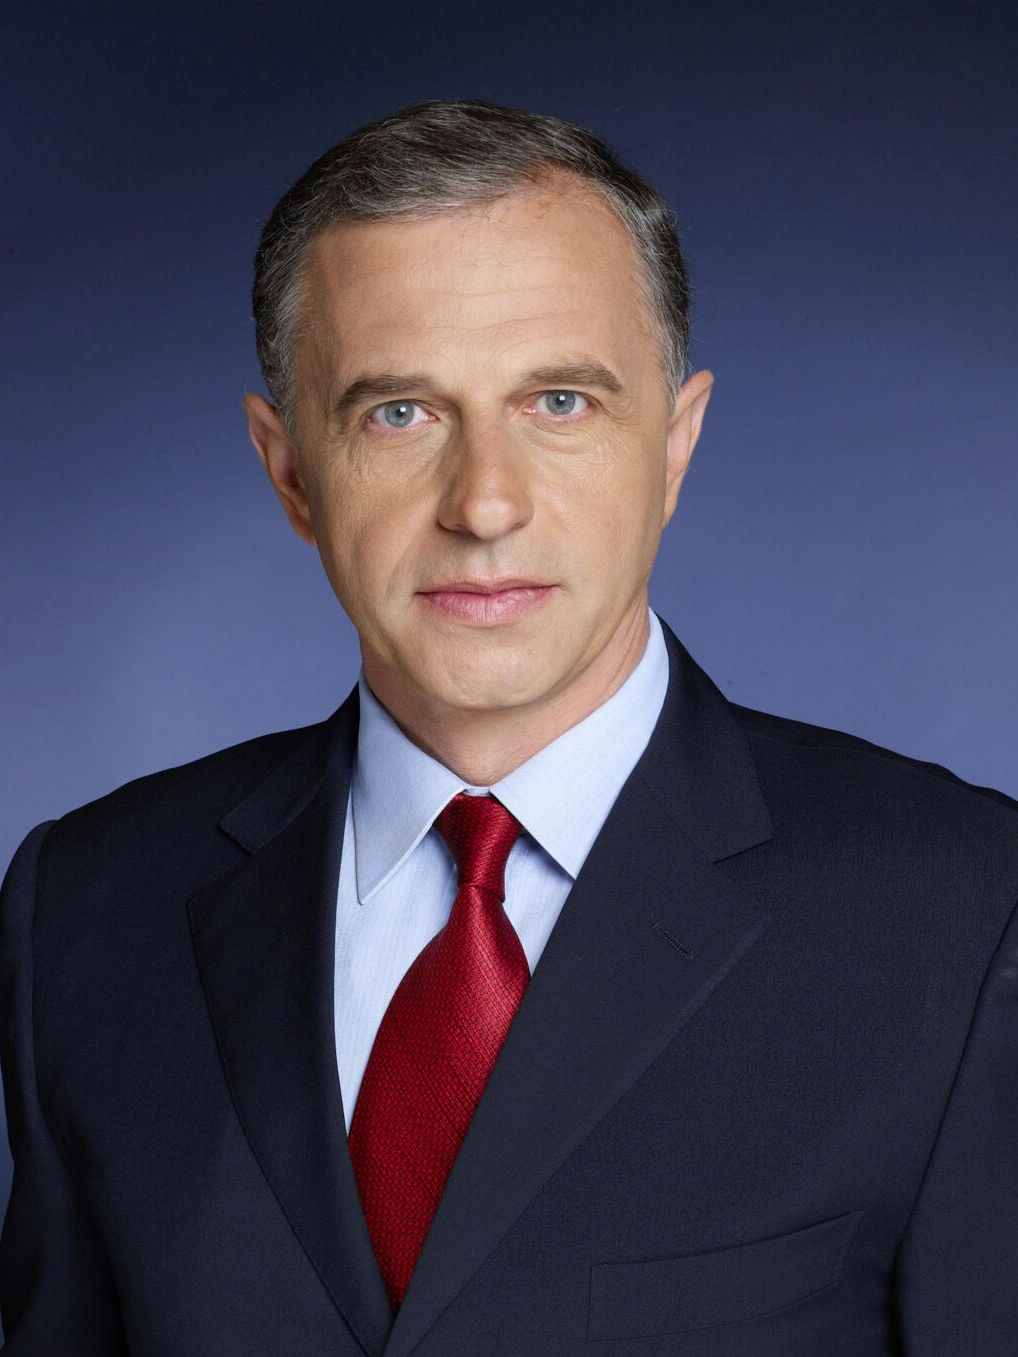 Mircea Geoană a fost numitsecretar general adjunct al NATO